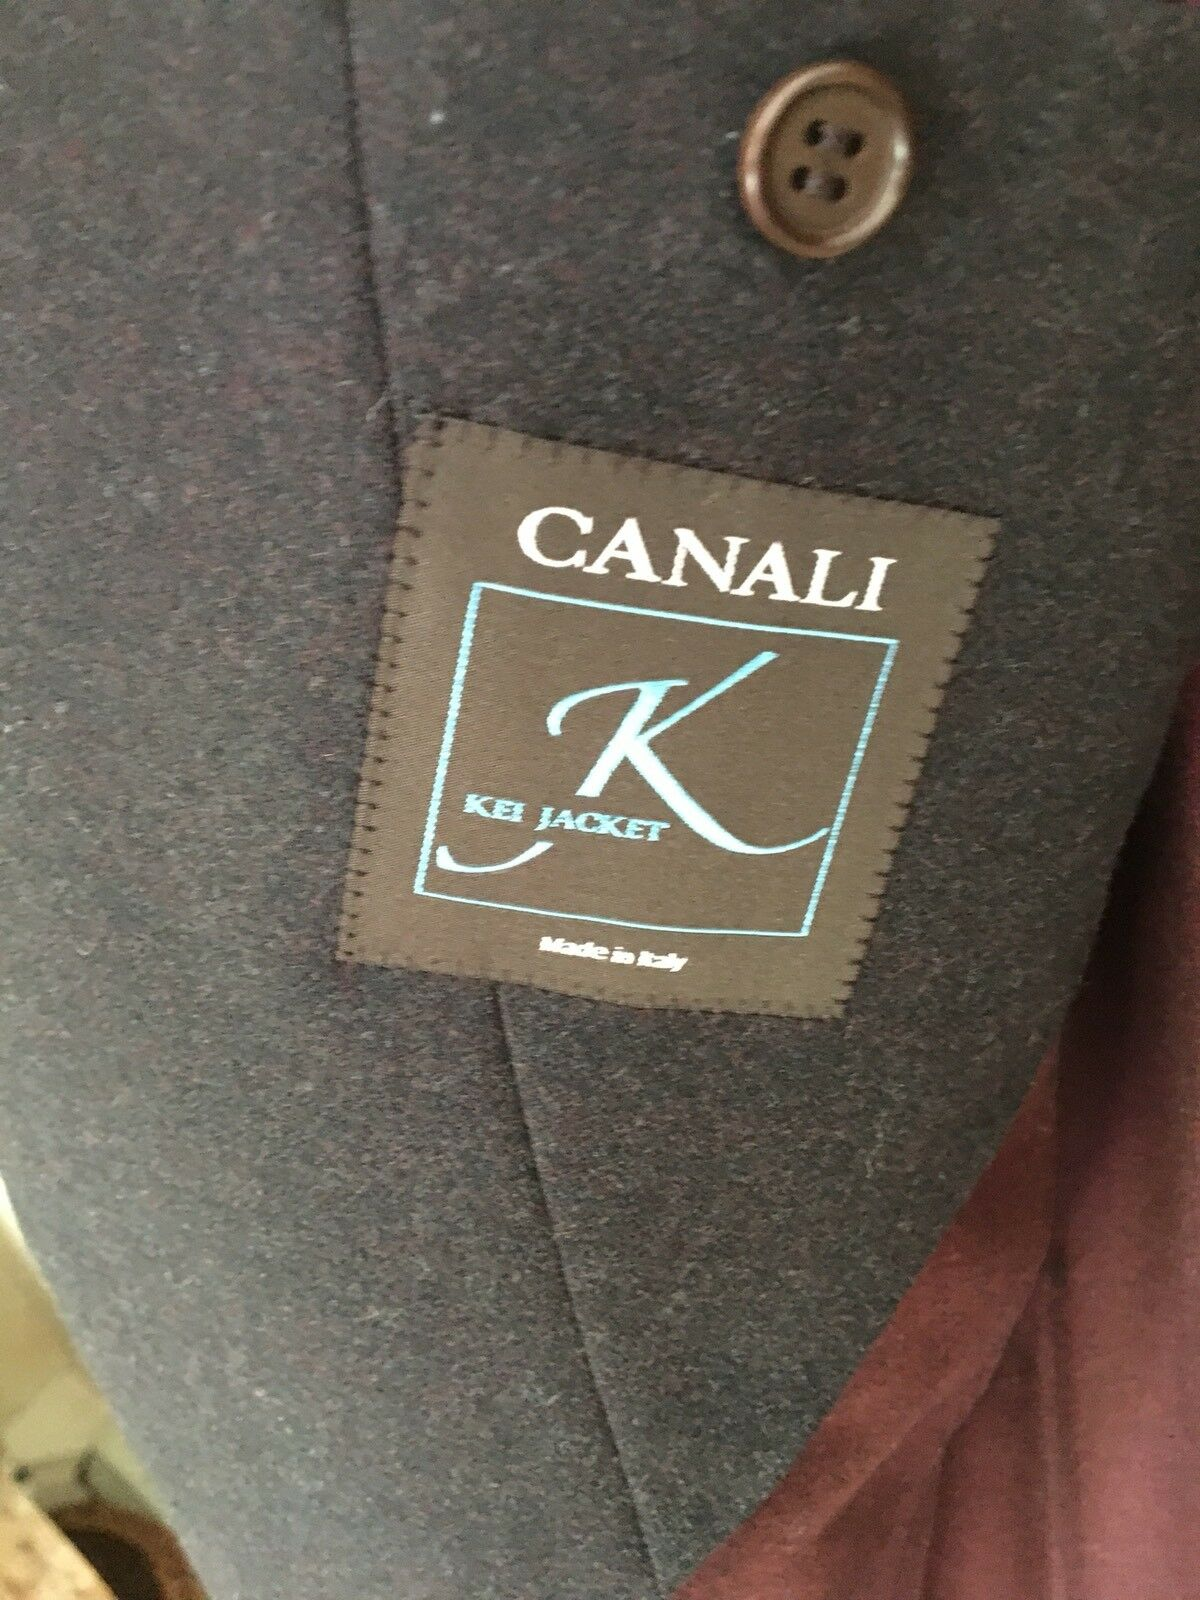 Canali Brown Kei Blazer 100% Cashmere 44R made in